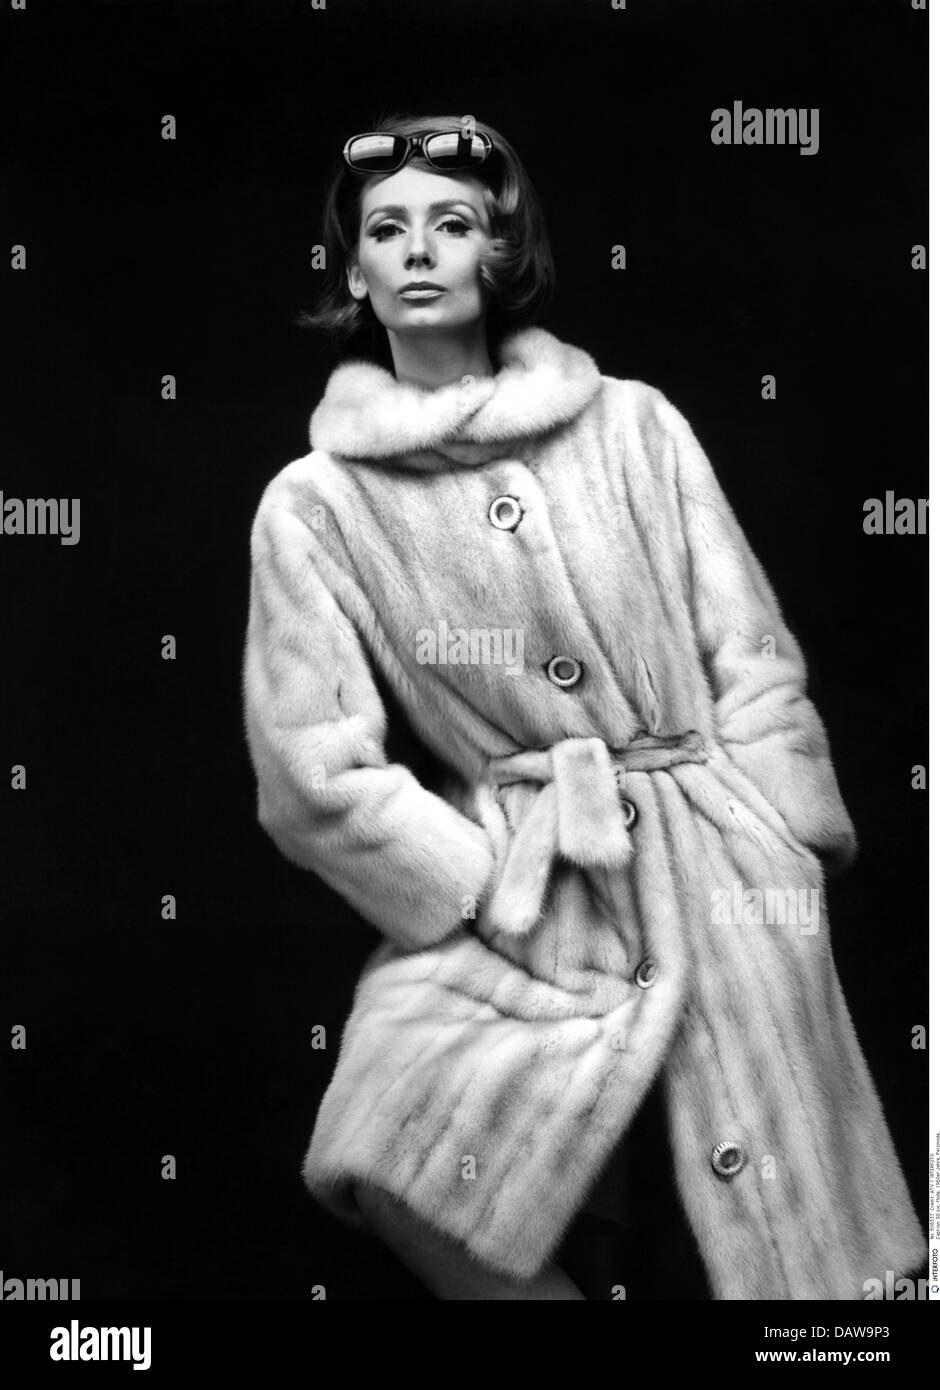 f4167de75b Fur Coat 1960s Stock Photos   Fur Coat 1960s Stock Images - Alamy